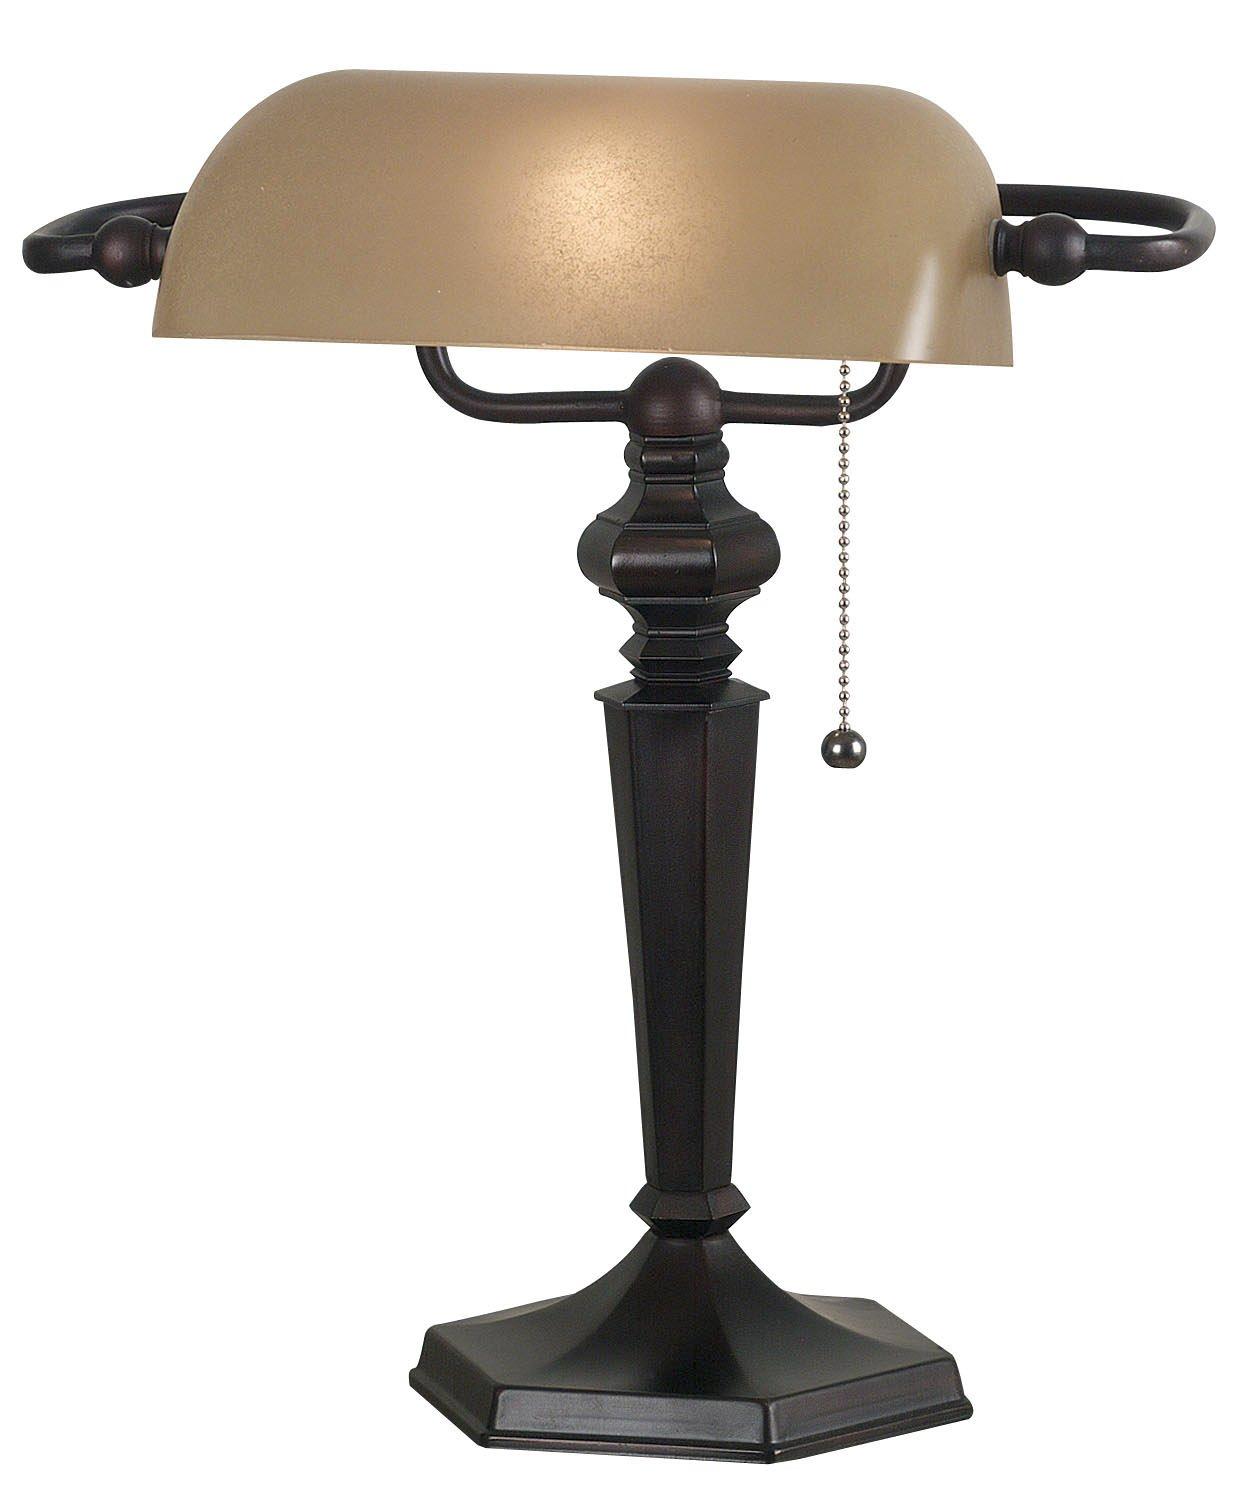 Kenroy Home 20610ORB Chesapeake Banker Lamp, Oil Rubbed Bronze